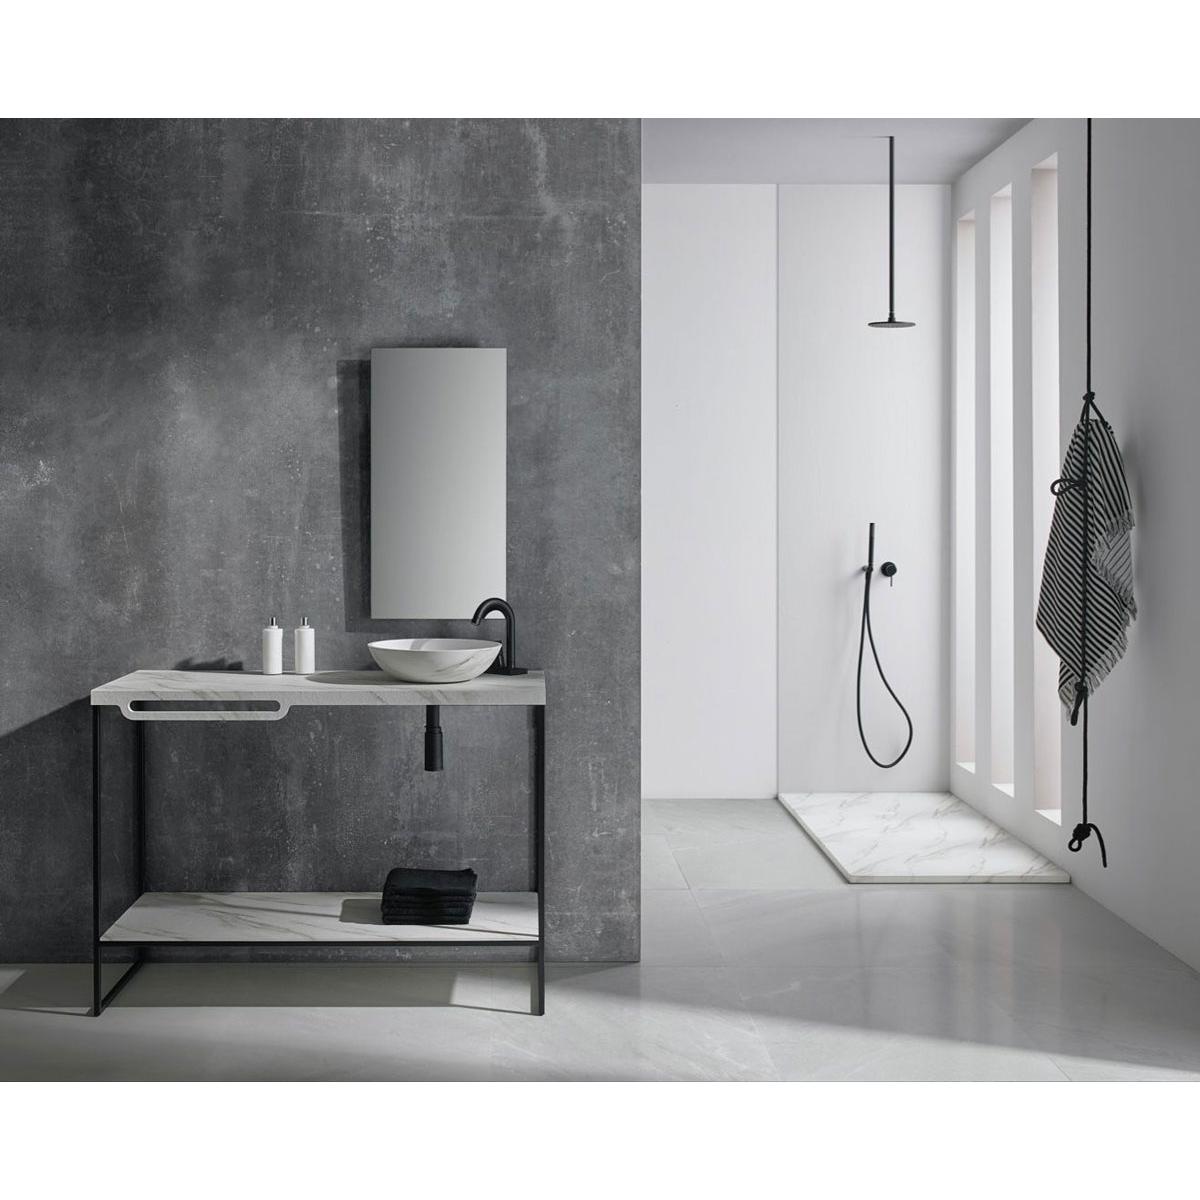 Plato de ducha rectangular 120x80 Mirage Travertino Gris